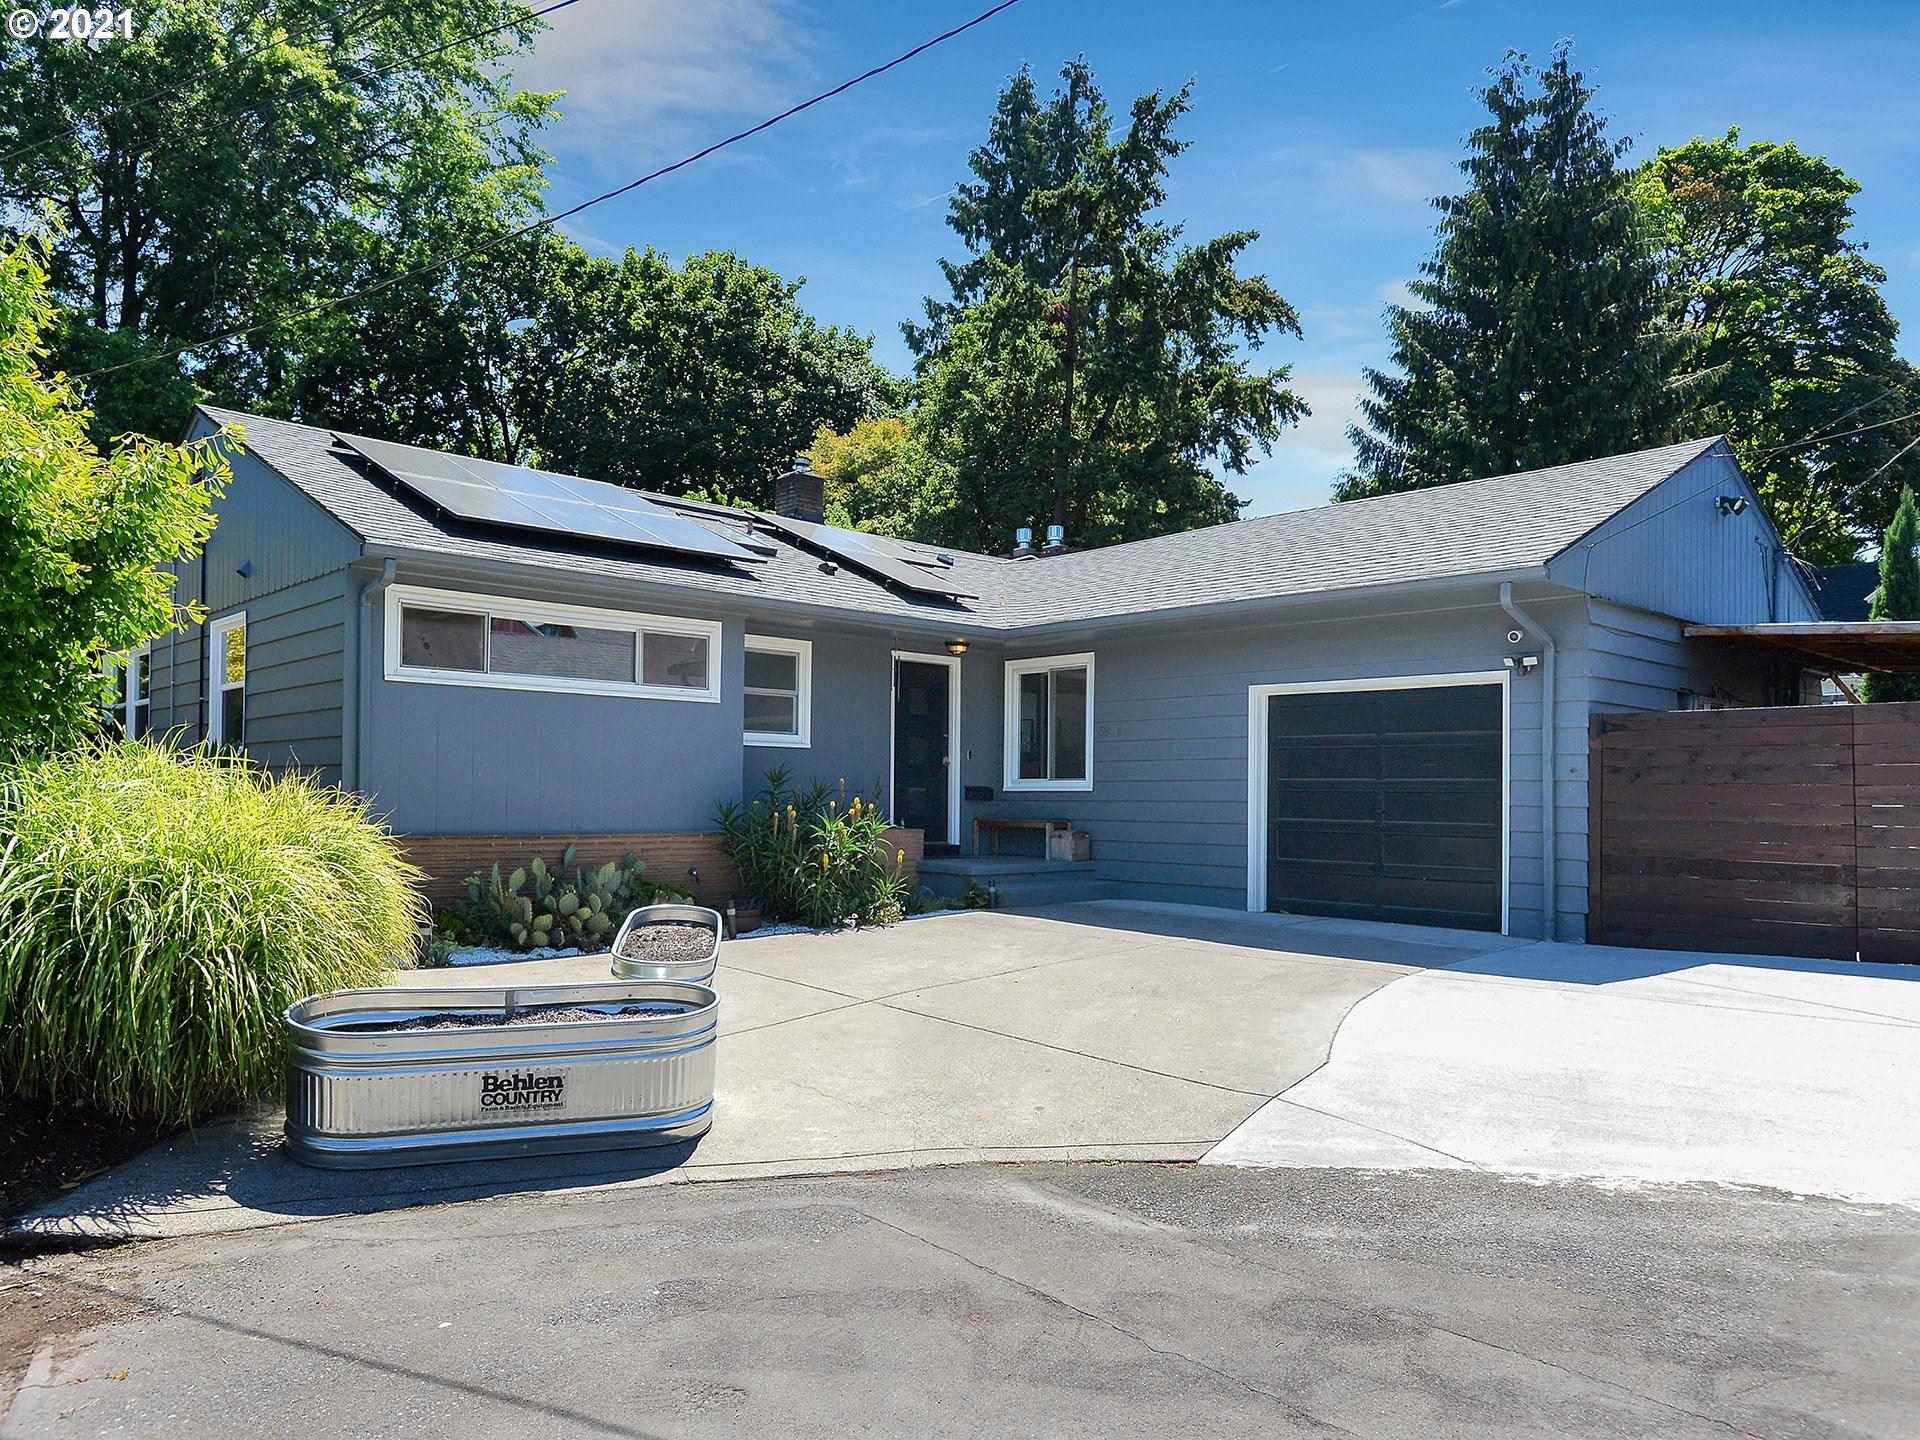 5904 NE 34TH AVE, Portland, OR 97211 - MLS#: 21219027